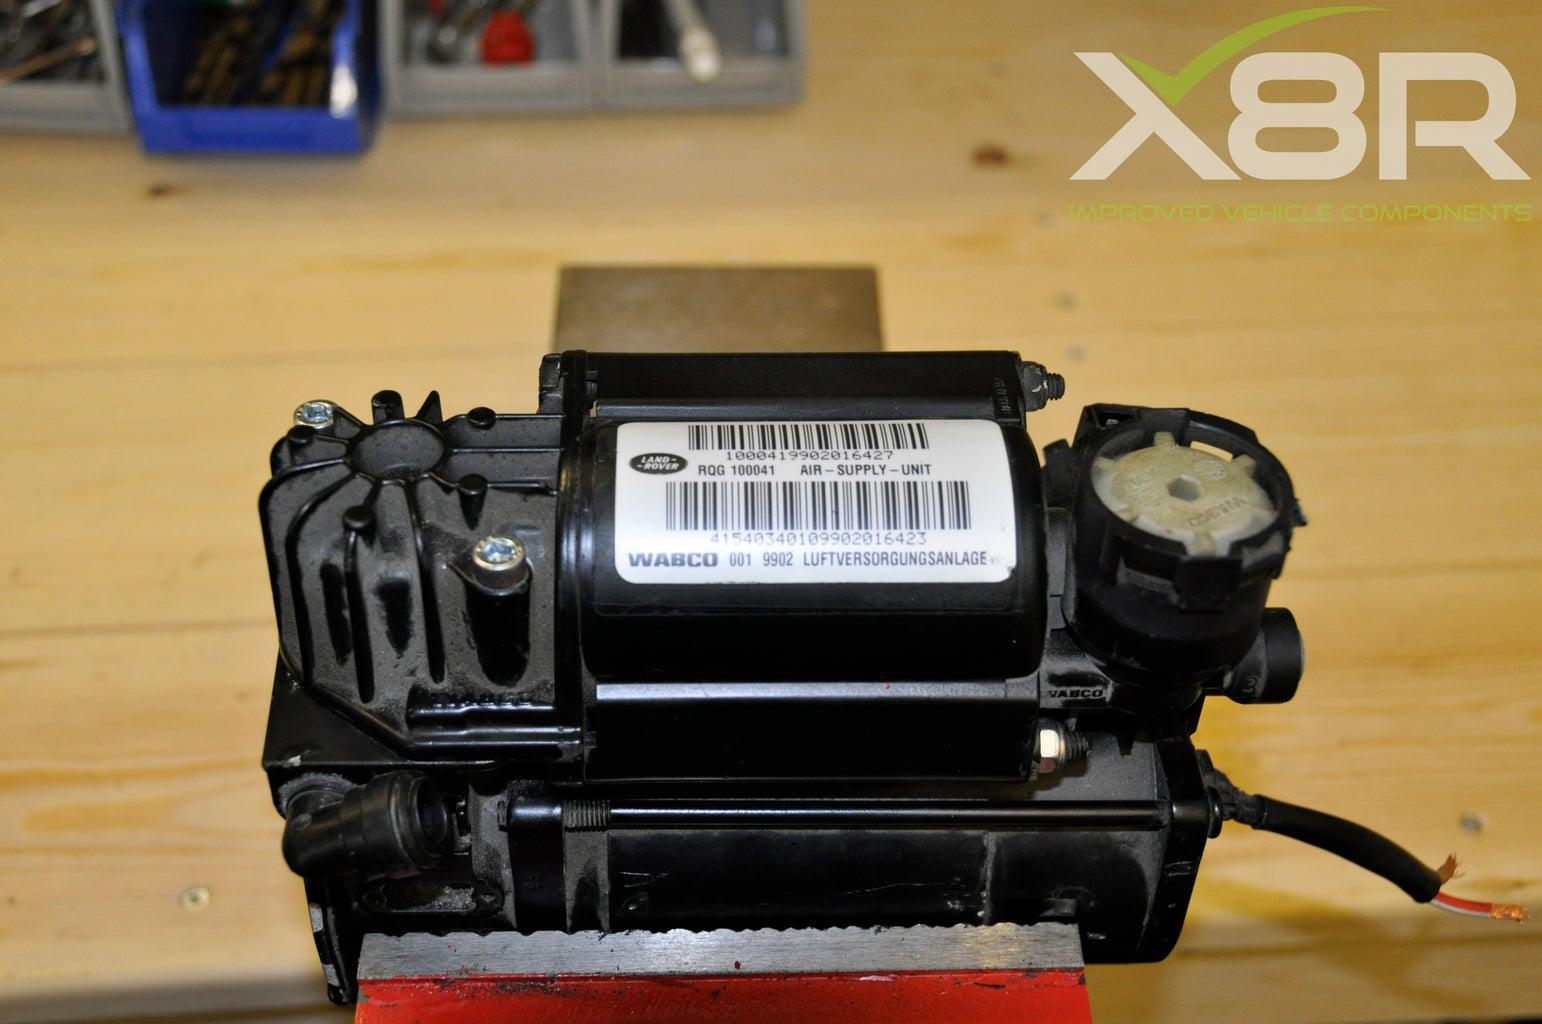 Wabco Air Suspension Compressor Piston Ring Seal Replacement Repair